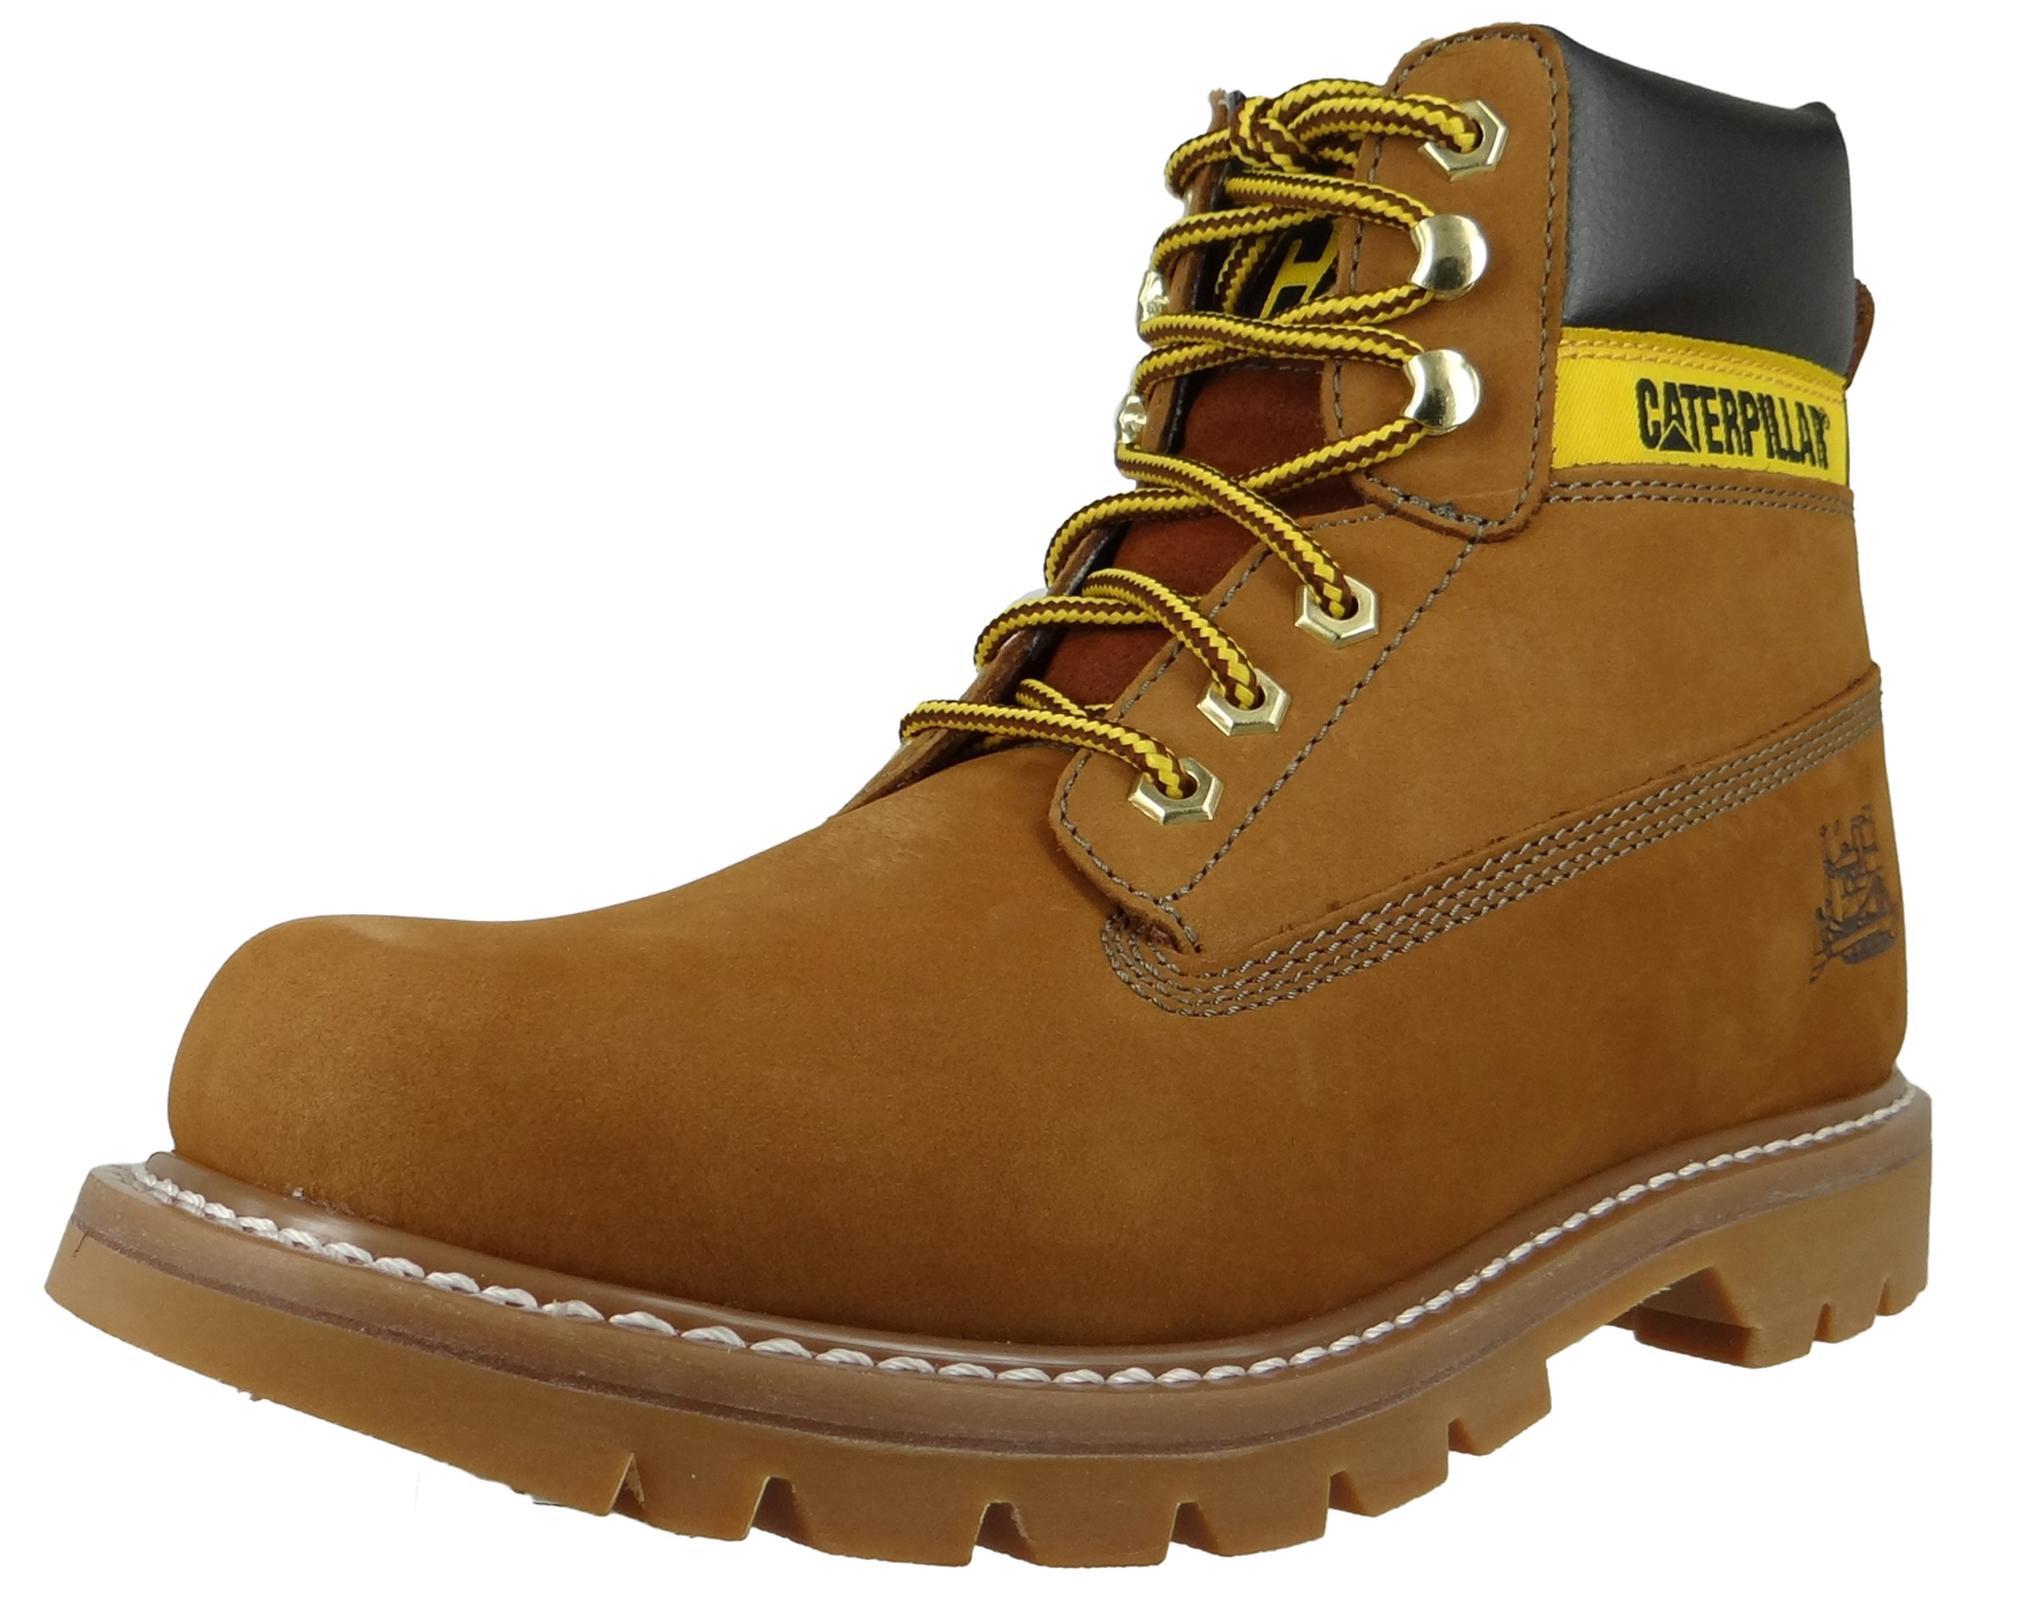 CAT Caterpillar Schuhe Colorado Sundanc WC44100952 Braun